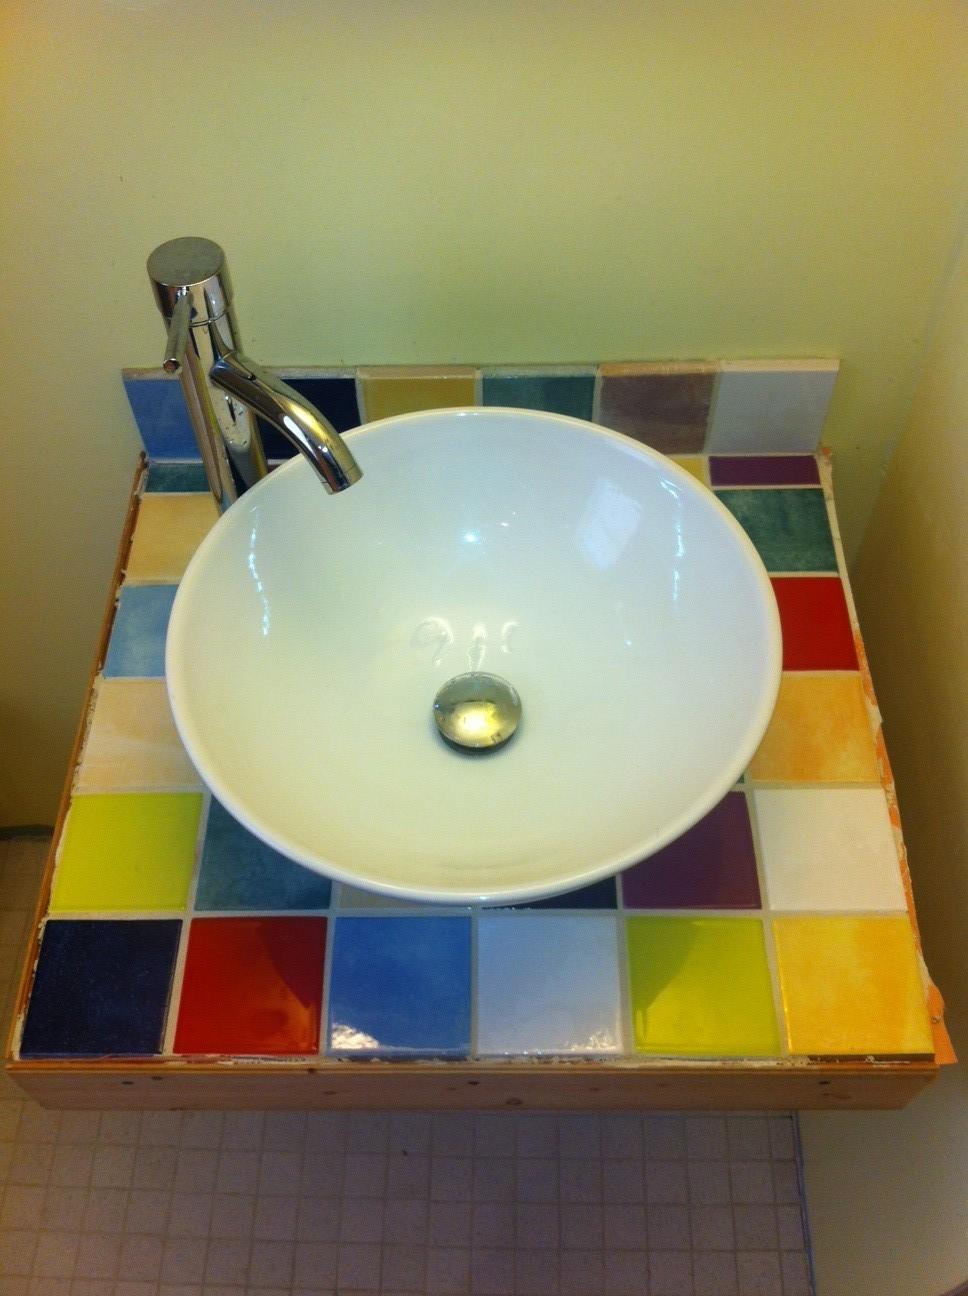 Siri's fun tile work under the (new) bathroom sink.